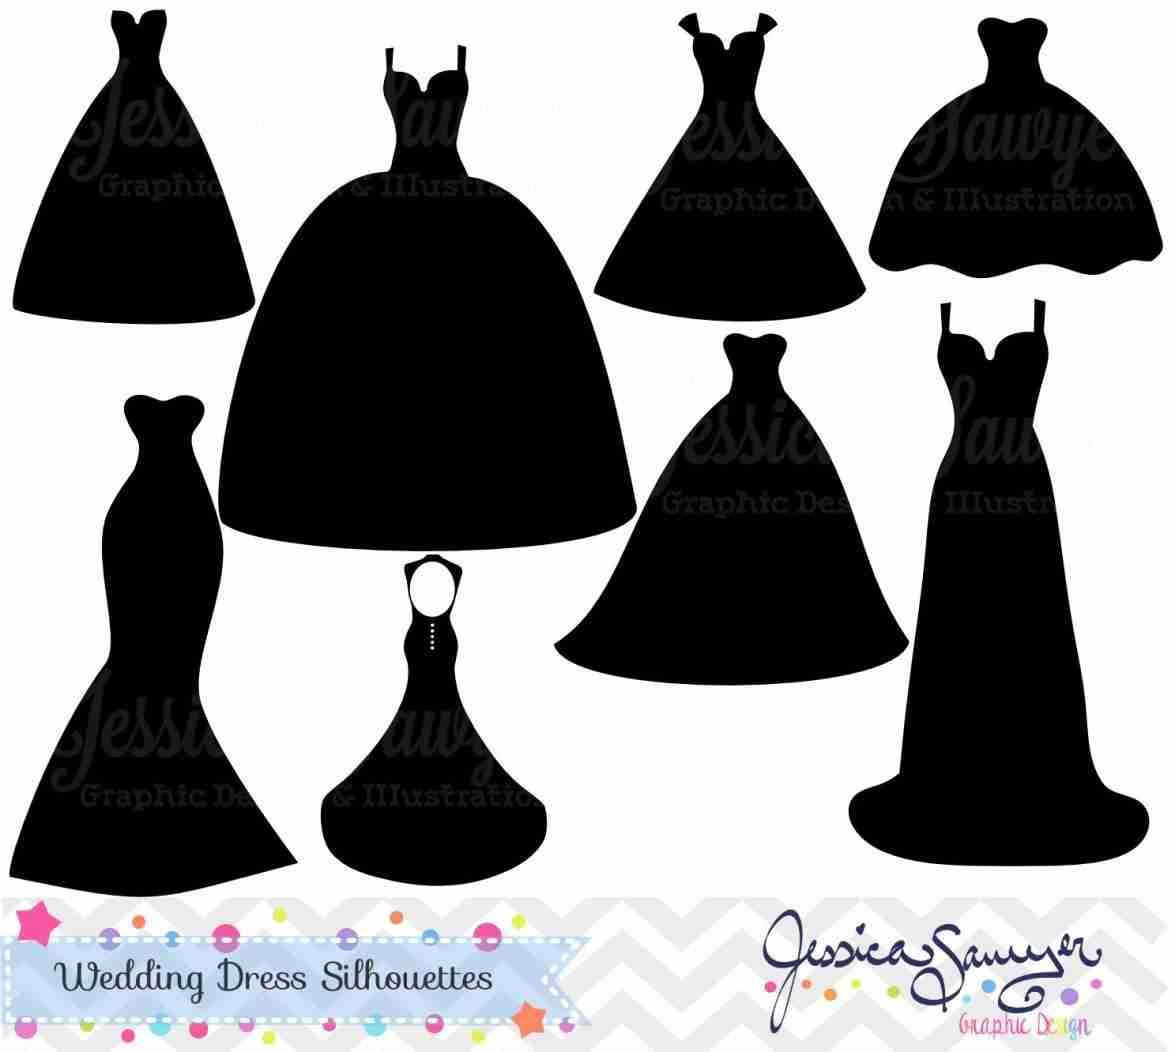 wedding dress silhouette black and white.